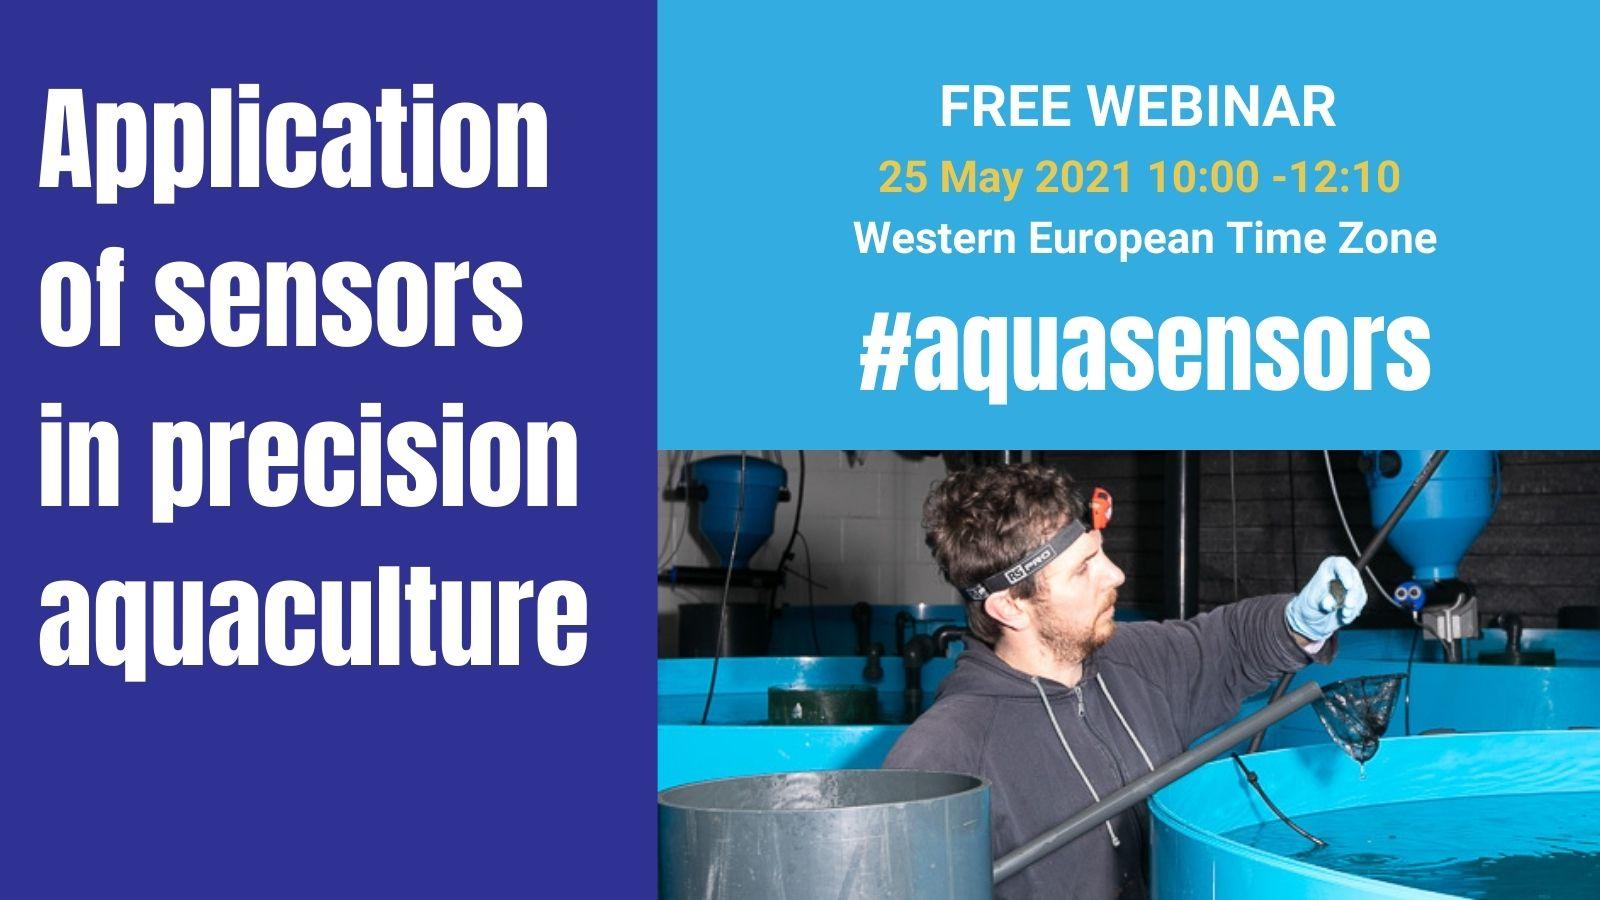 Application of Sensors in Precision Aquaculture. webinar banner showing CSAR facilities and lumpfish